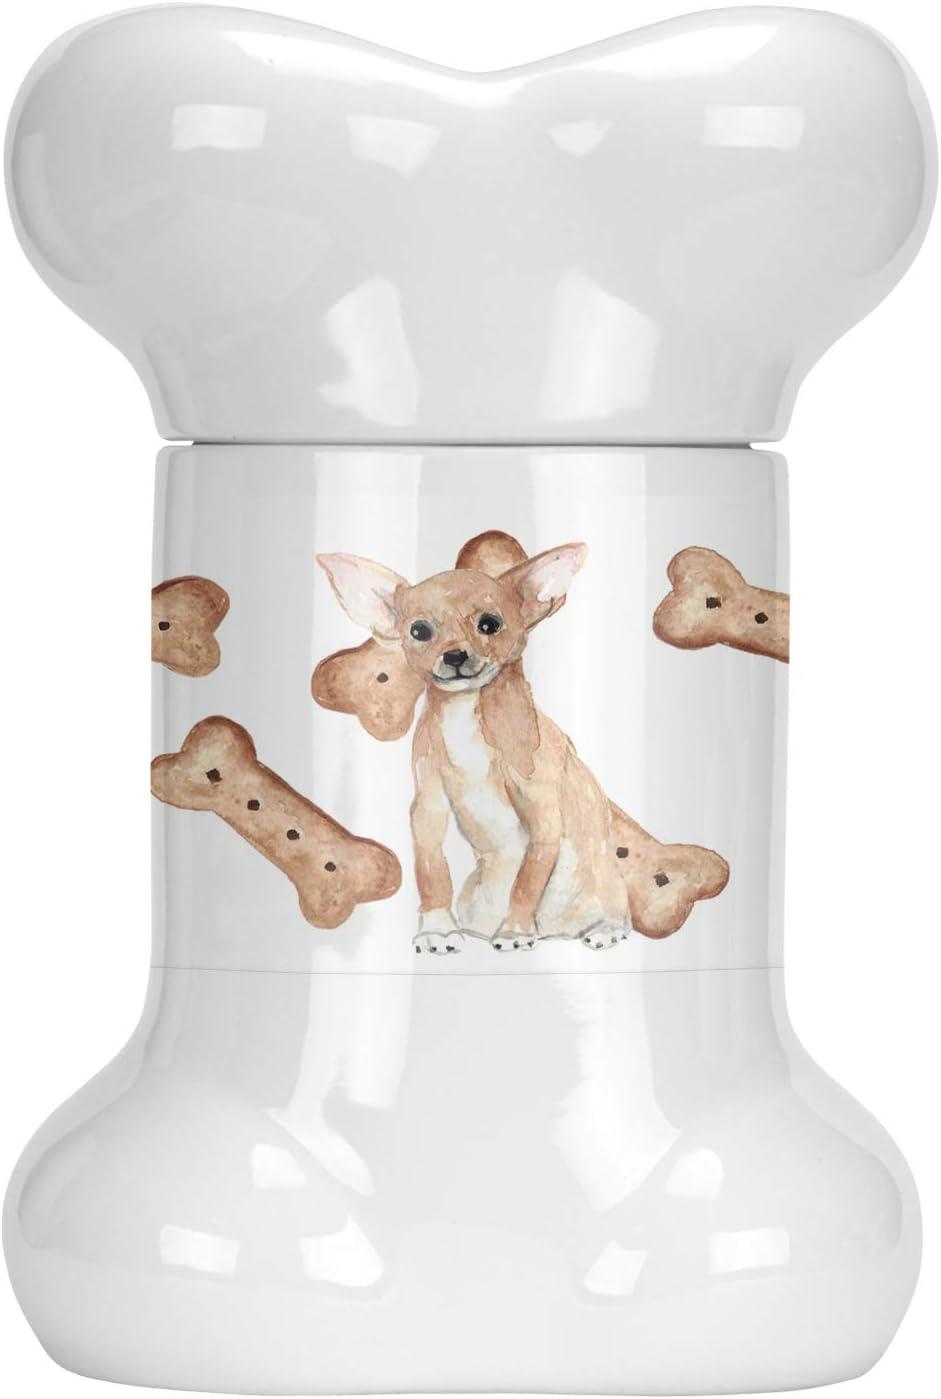 Caroline's Treasures CK2369BSTJ Chihuahua Puppy New Indianapolis Mall life Bone Shaped Trea